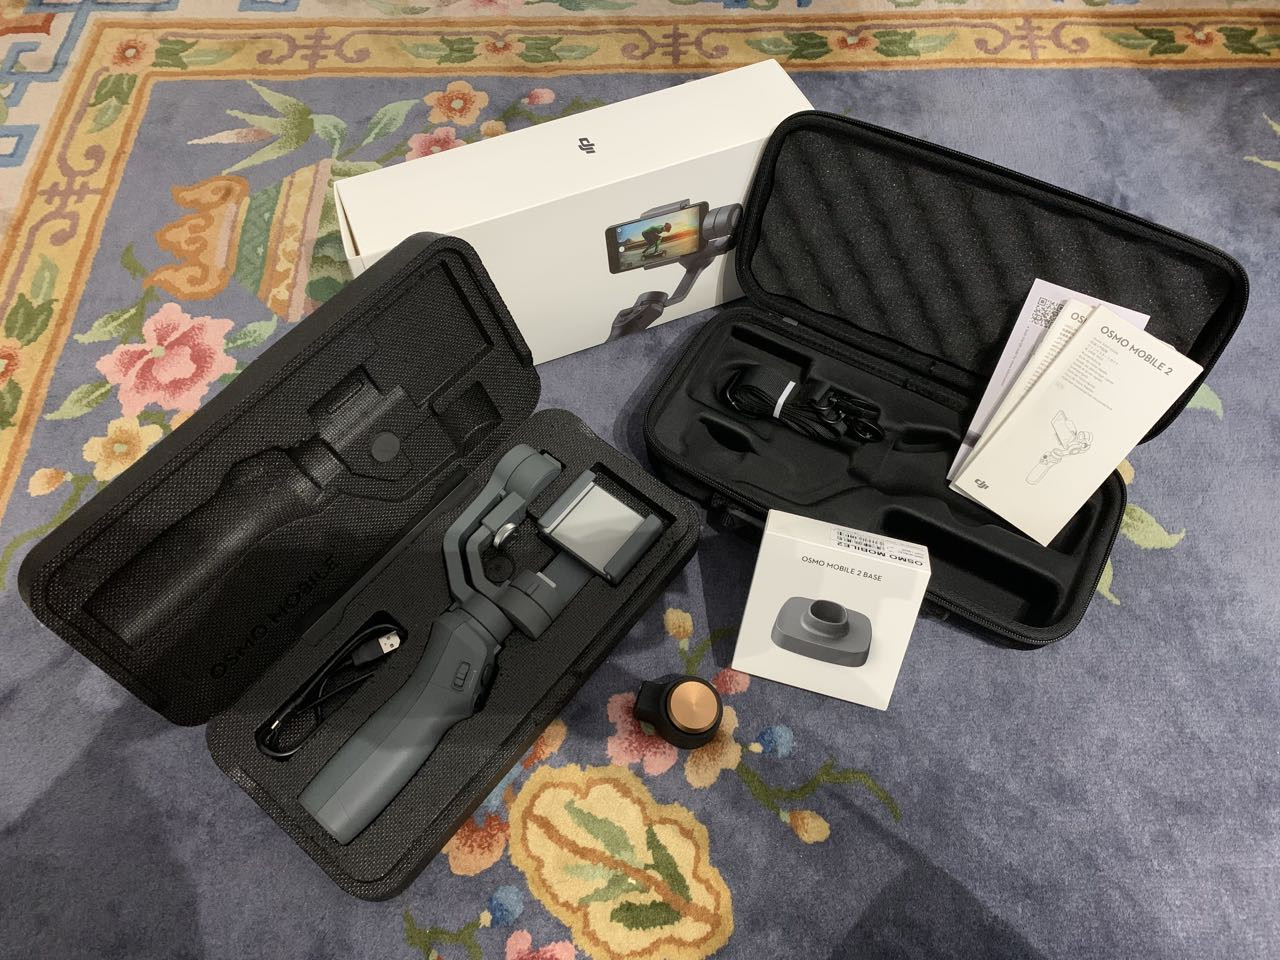 DJI Osmo Mobile 2 + accessoires